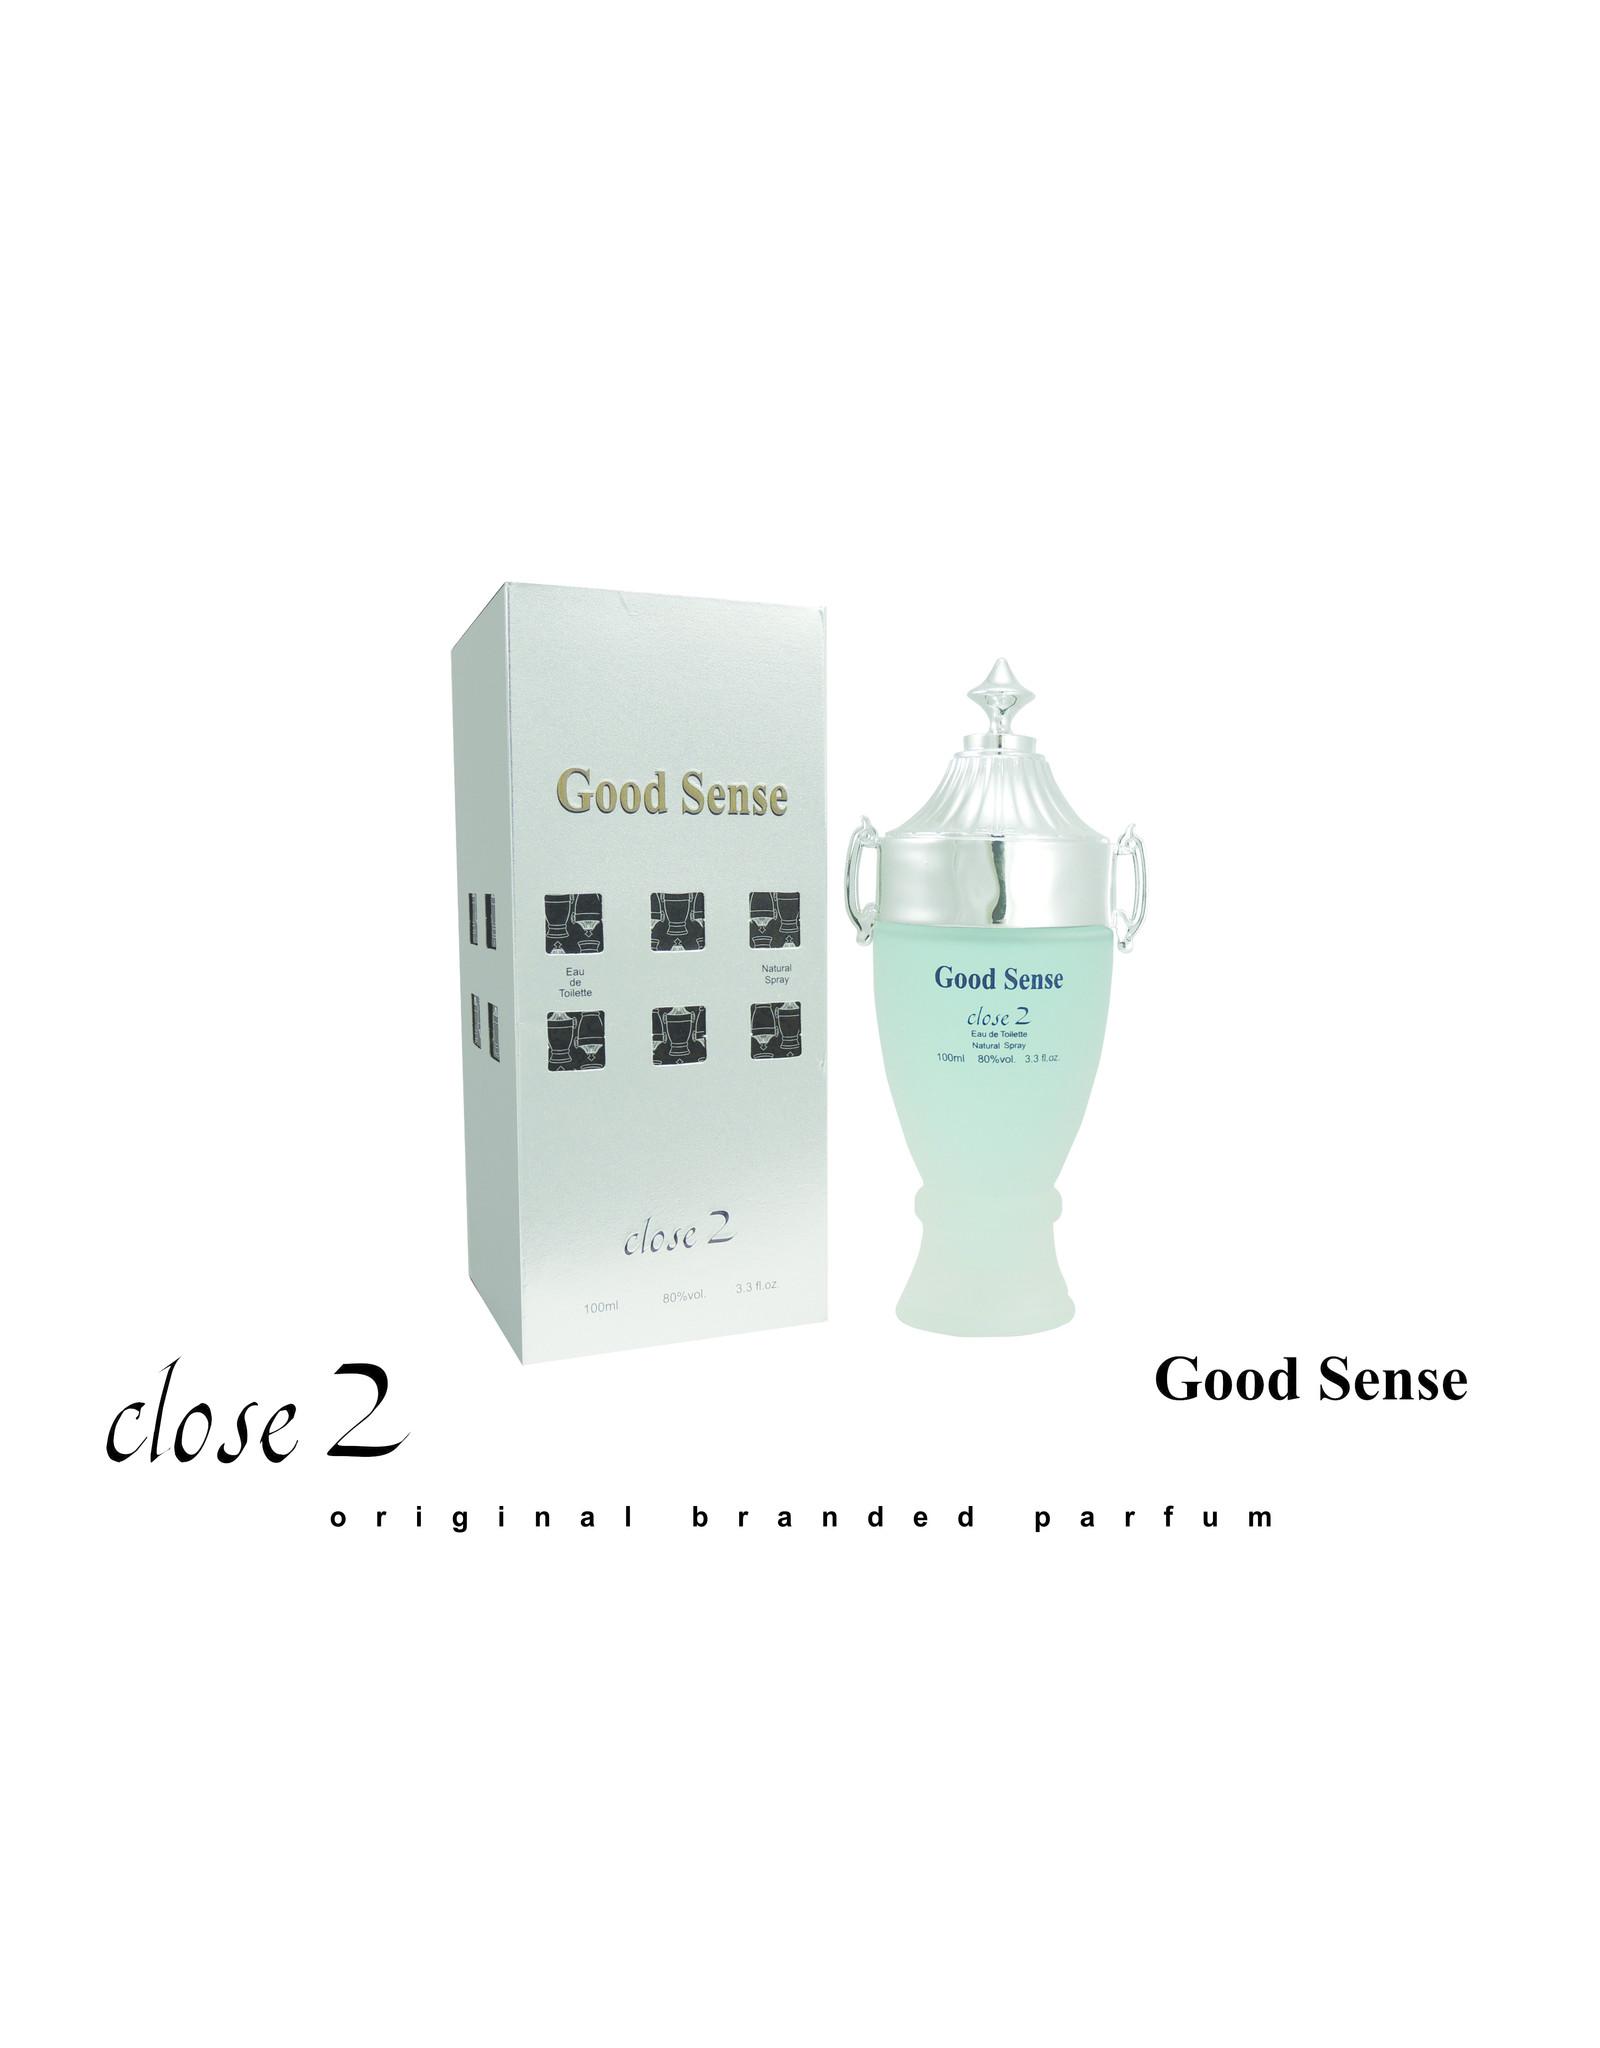 Close 2 parfums Good Sense EDT 100 ml